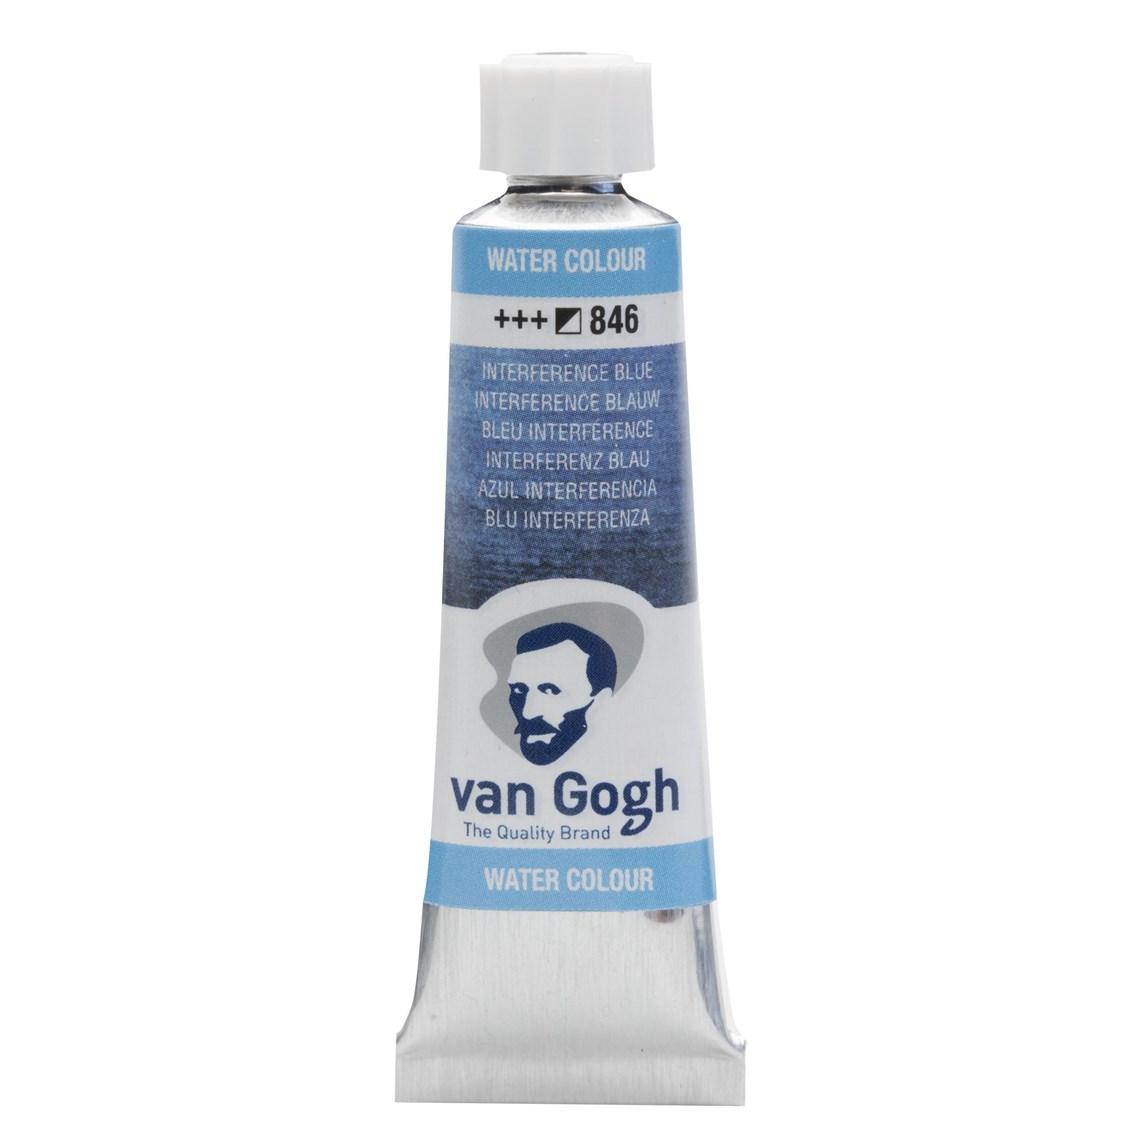 Aquarelverf Interfence blauw 846 tube 10 ml. Van Gogh